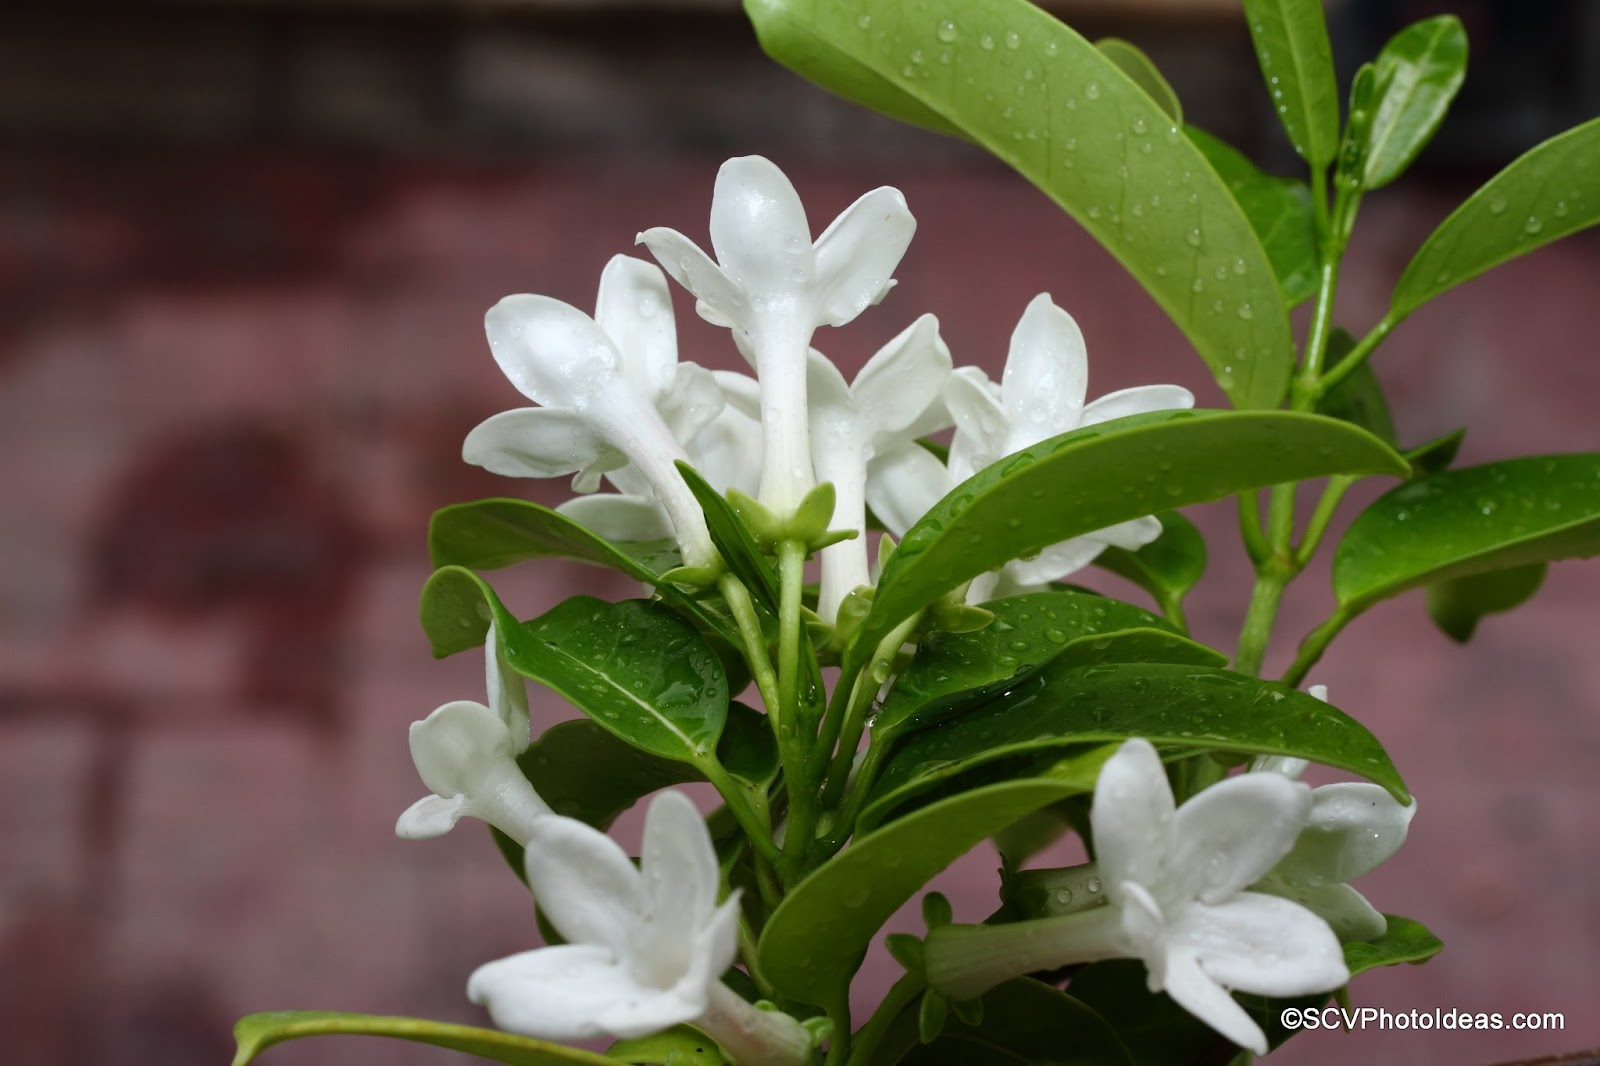 Stephanotis floribunda (Madagascar jasmine) showered open flowers bunch